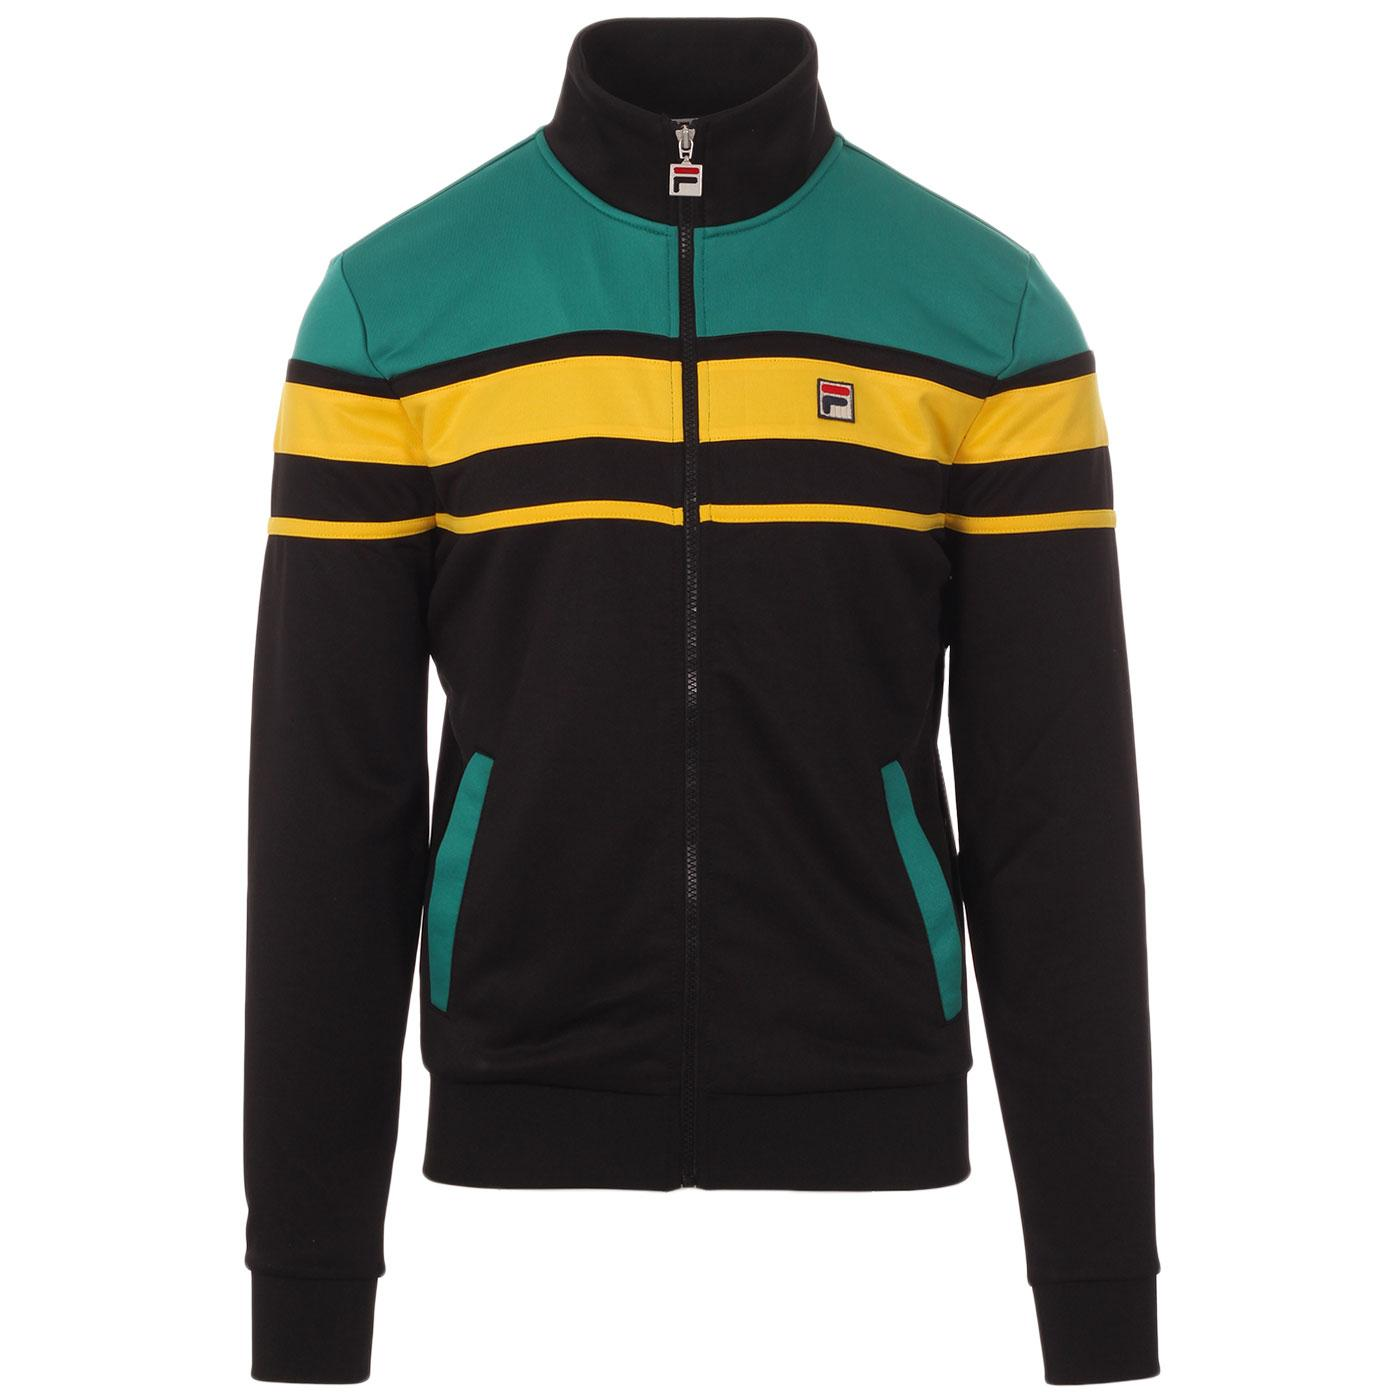 Gordon FILA VINTAGE 80s Stripe Track Jacket (B/P)